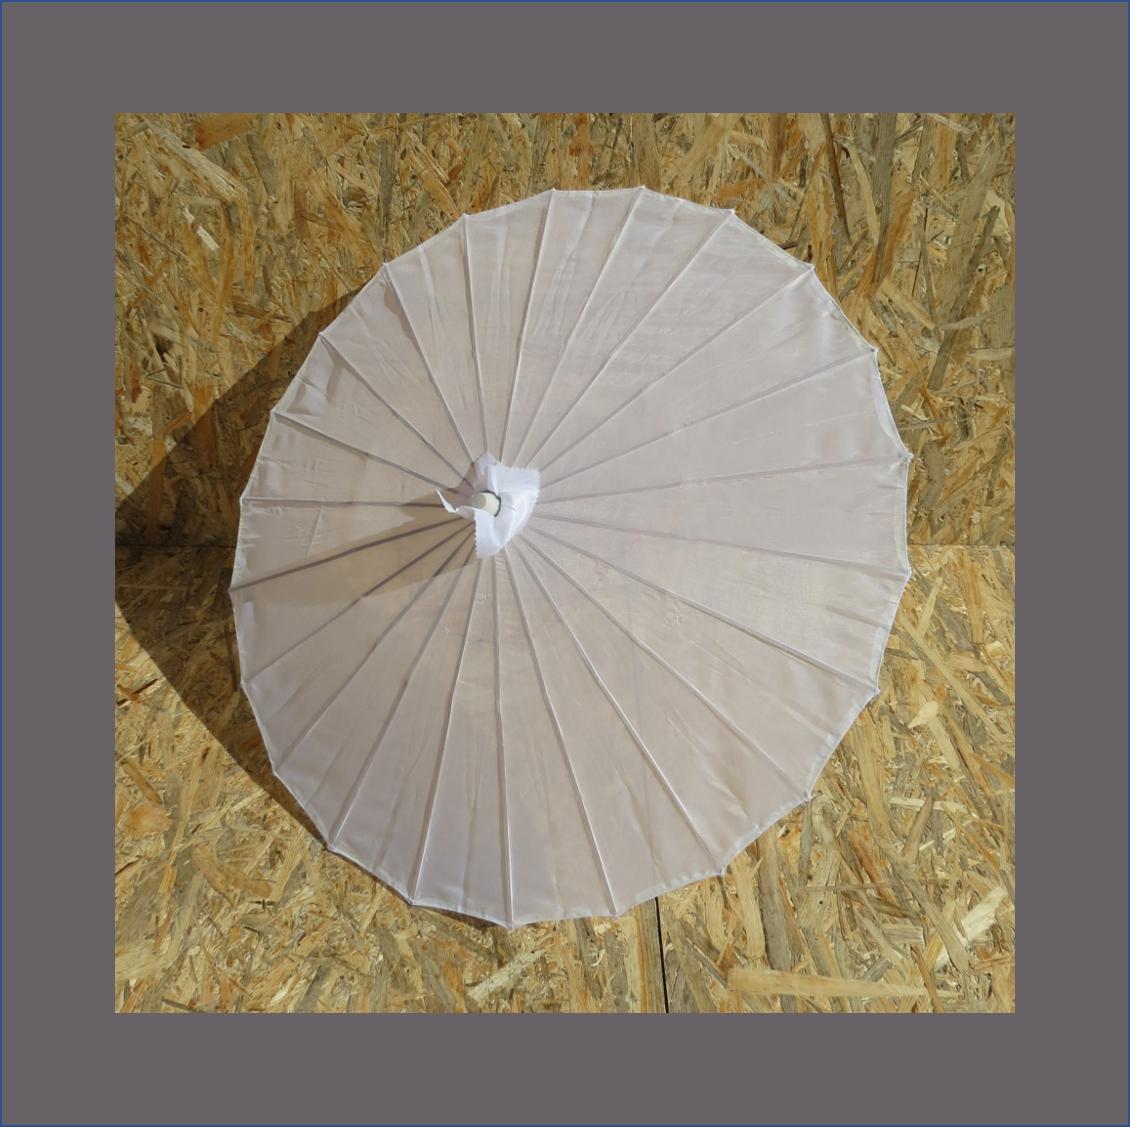 chinese-umbrella